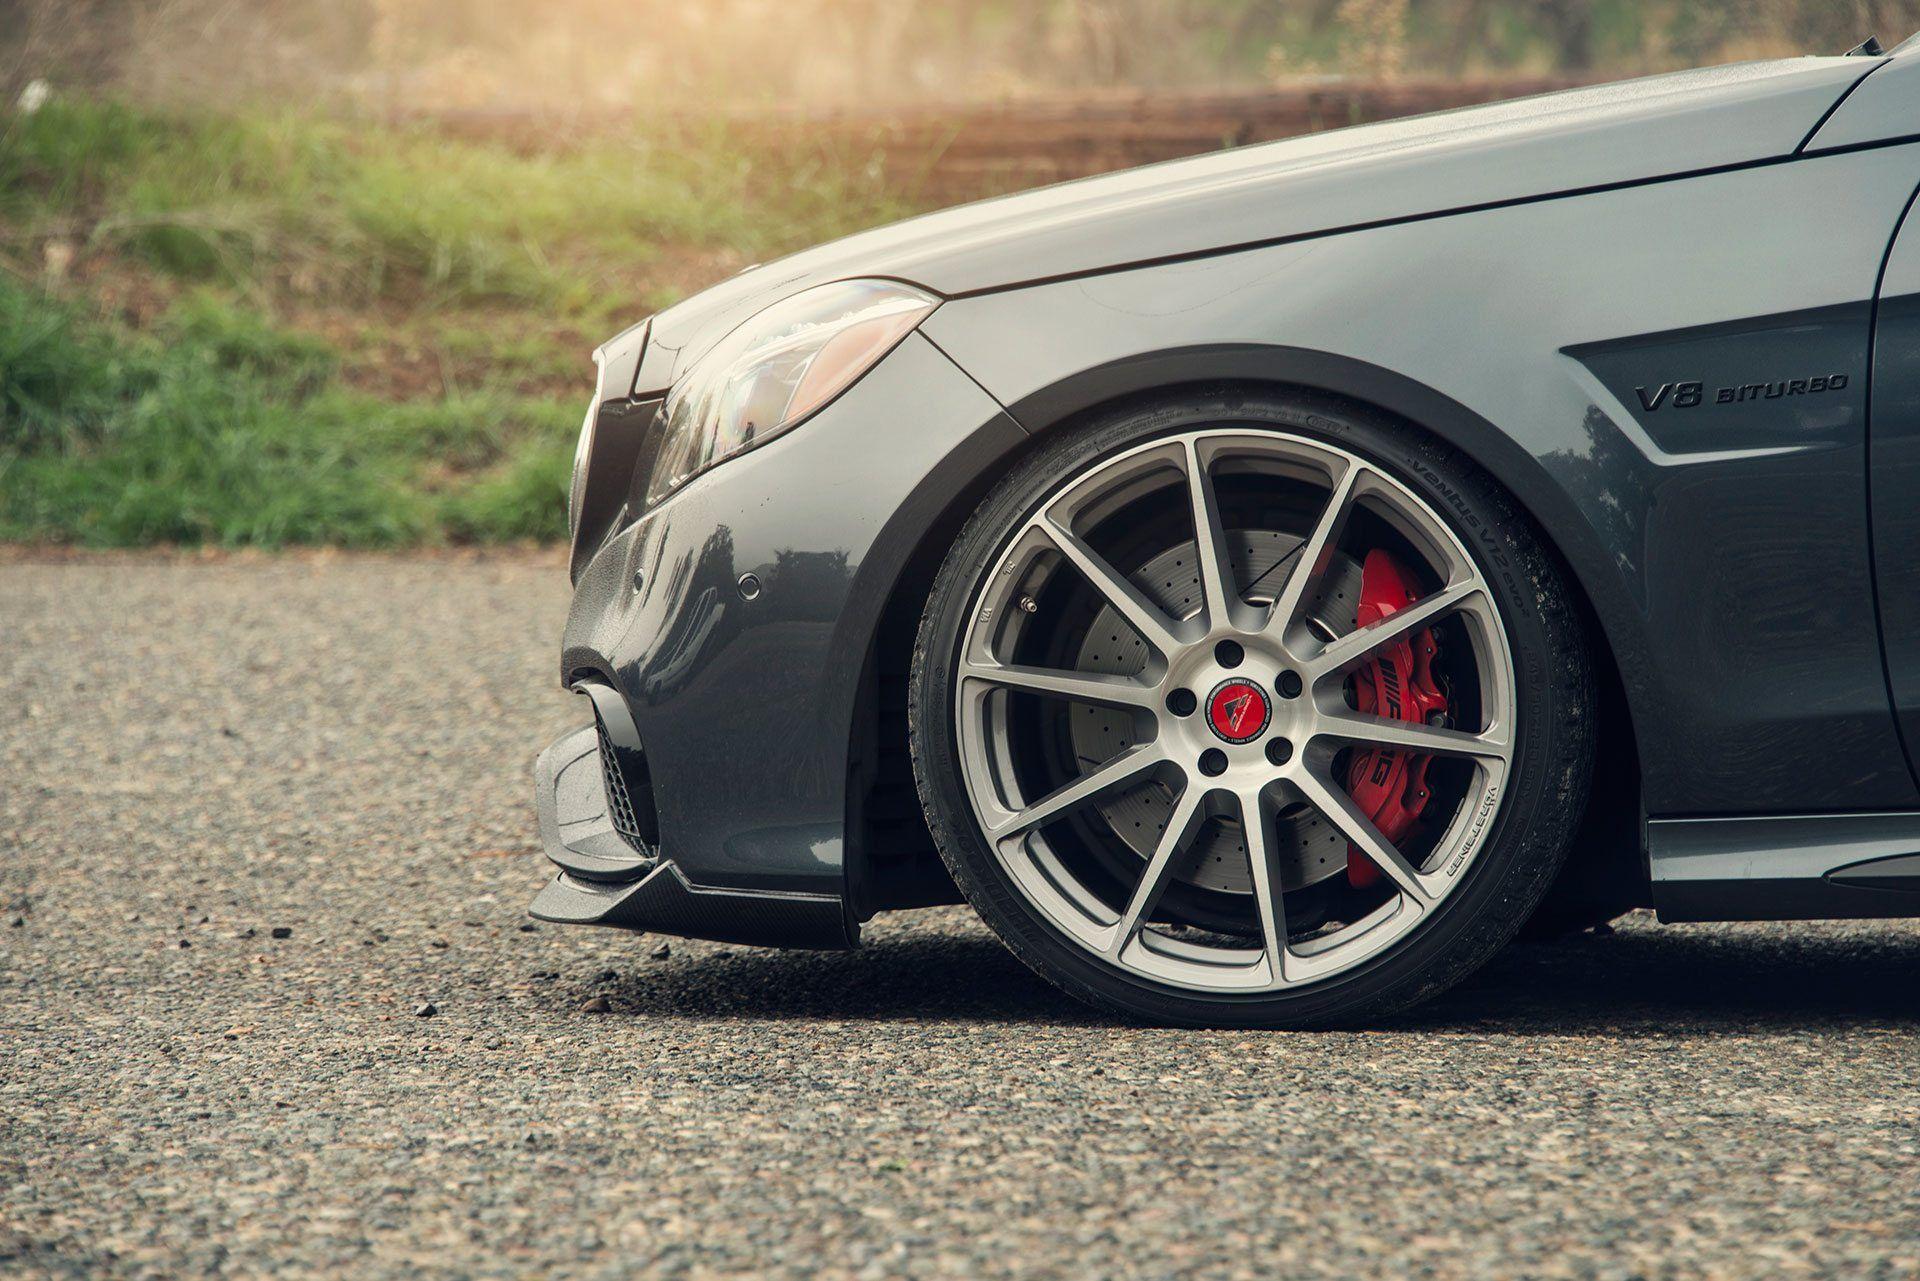 Mercedes-Benz E63 AMG W212 Facelift VBR Aero Front Spoiler - Vorsteiner